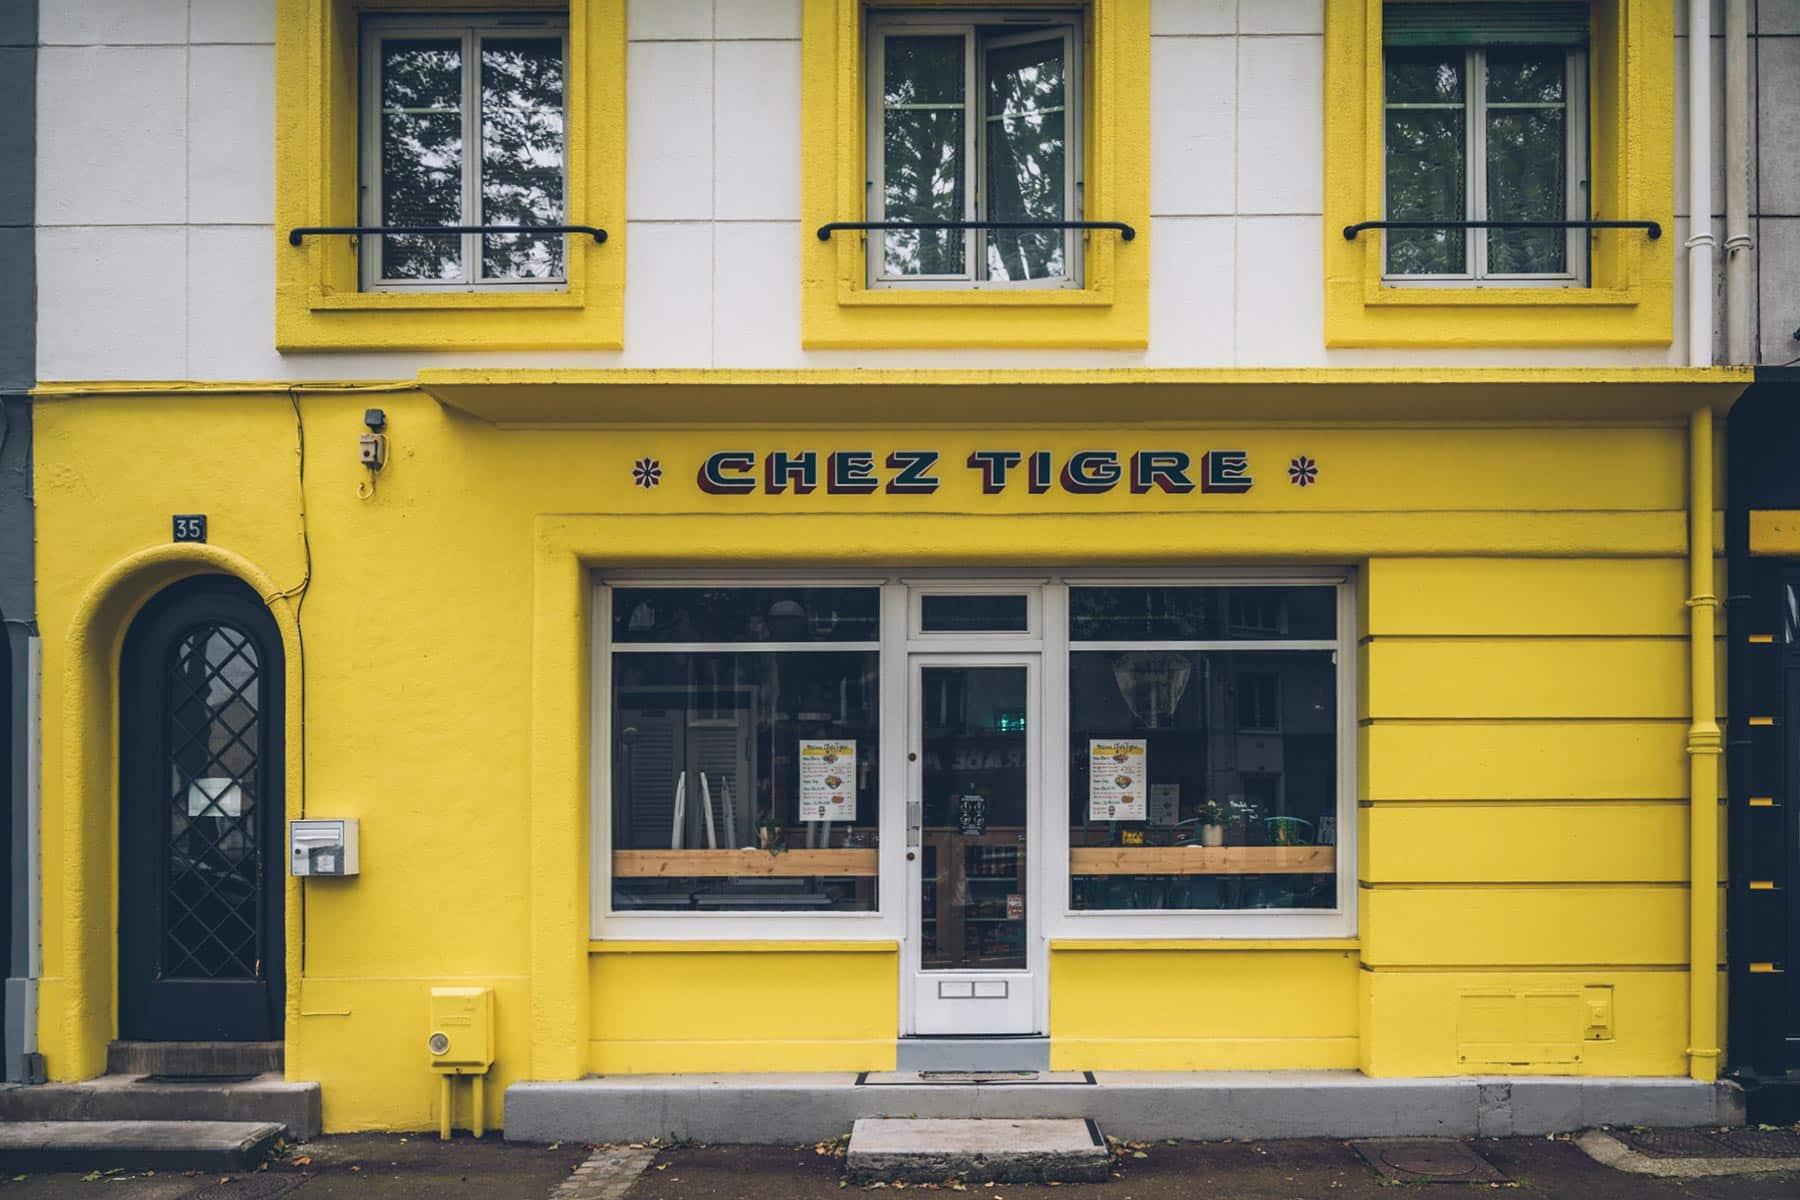 Chez tigre, Lorient